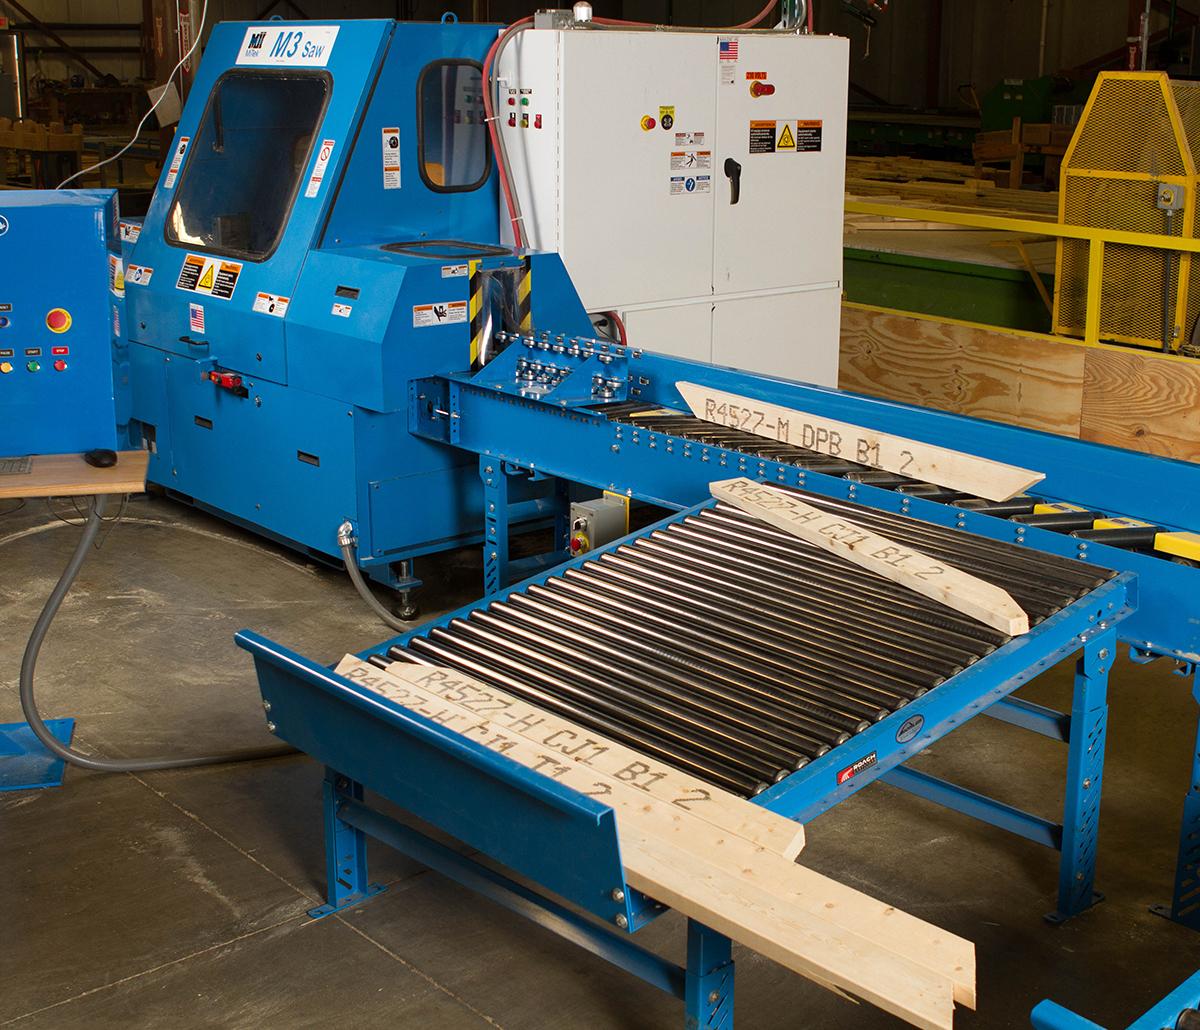 MiTek Blade Screwed Conveyor Automated Solutions - Blew Screwed conveyor in warehouse facility